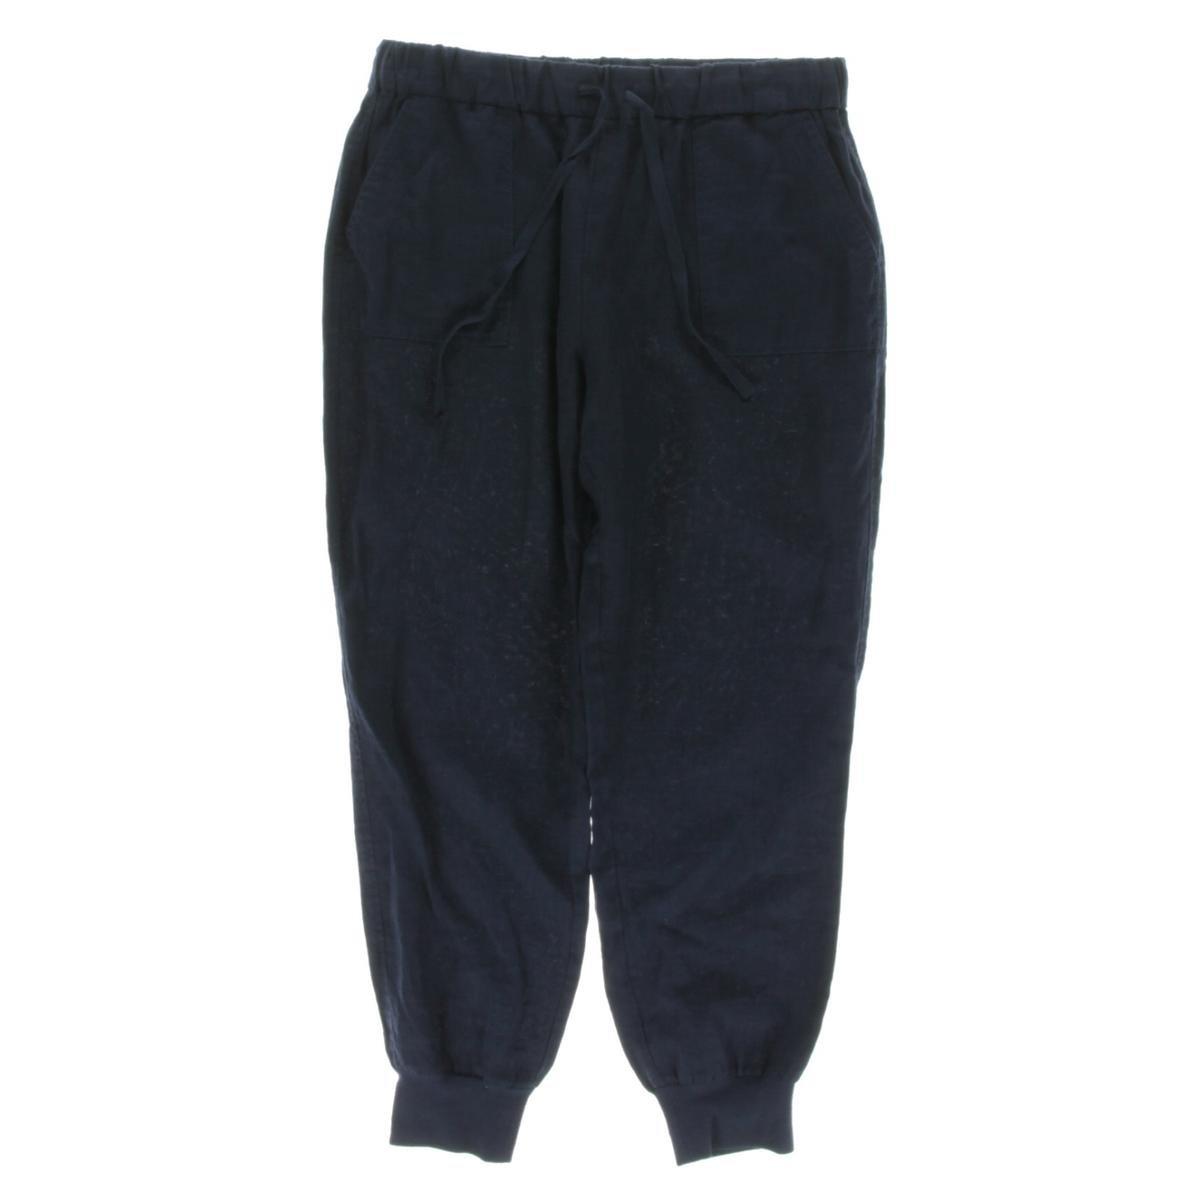 Joie Women's Stuva Linen Pant, Dark Navy, Medium by Joie